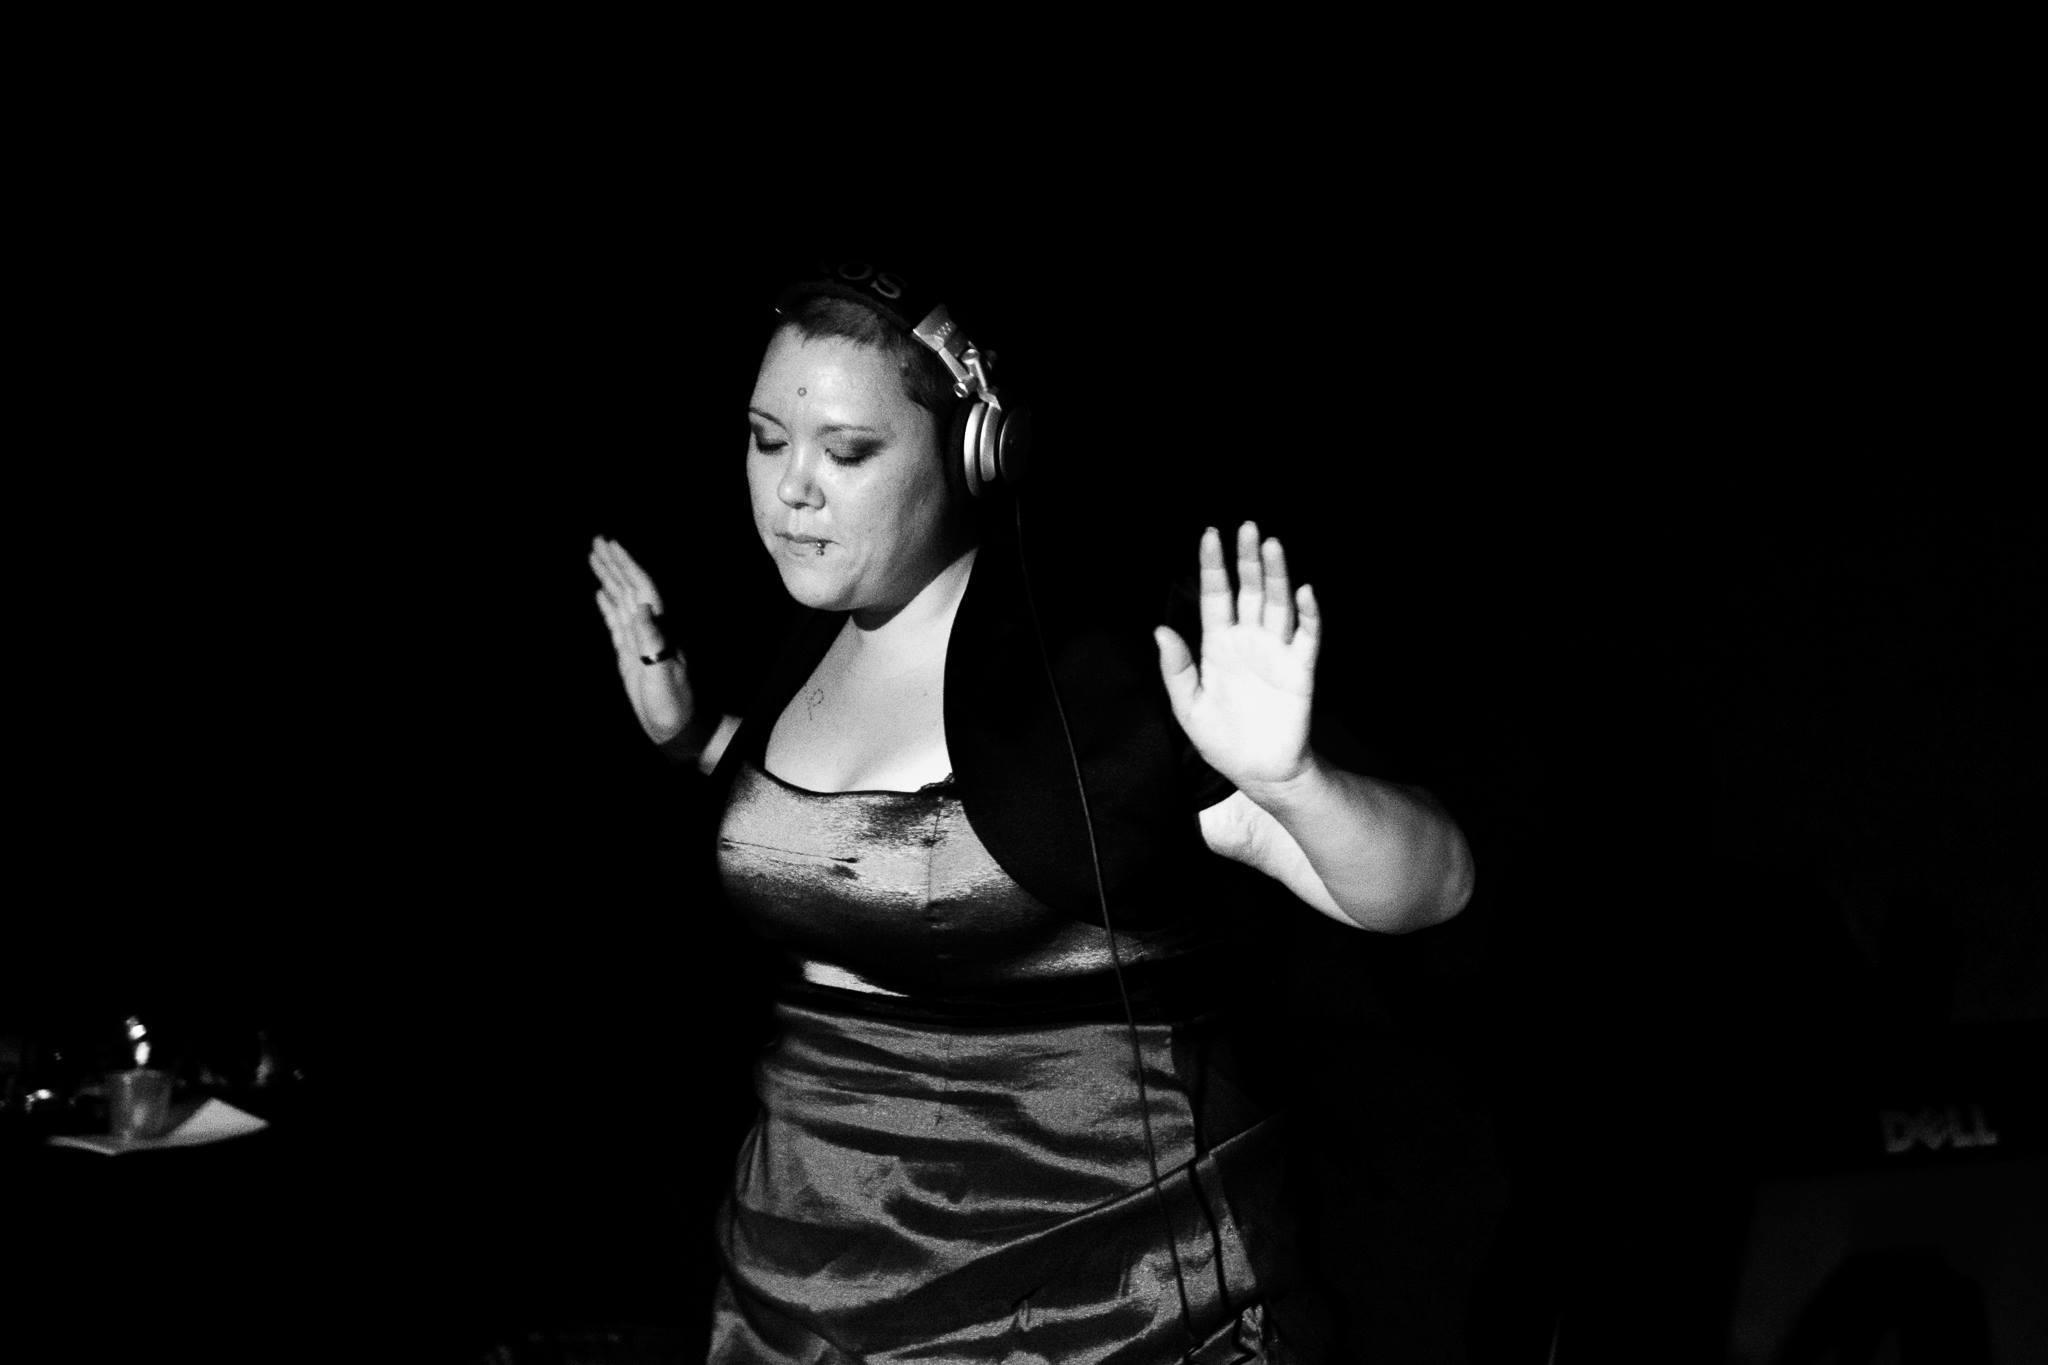 April Lowe - Our DJ